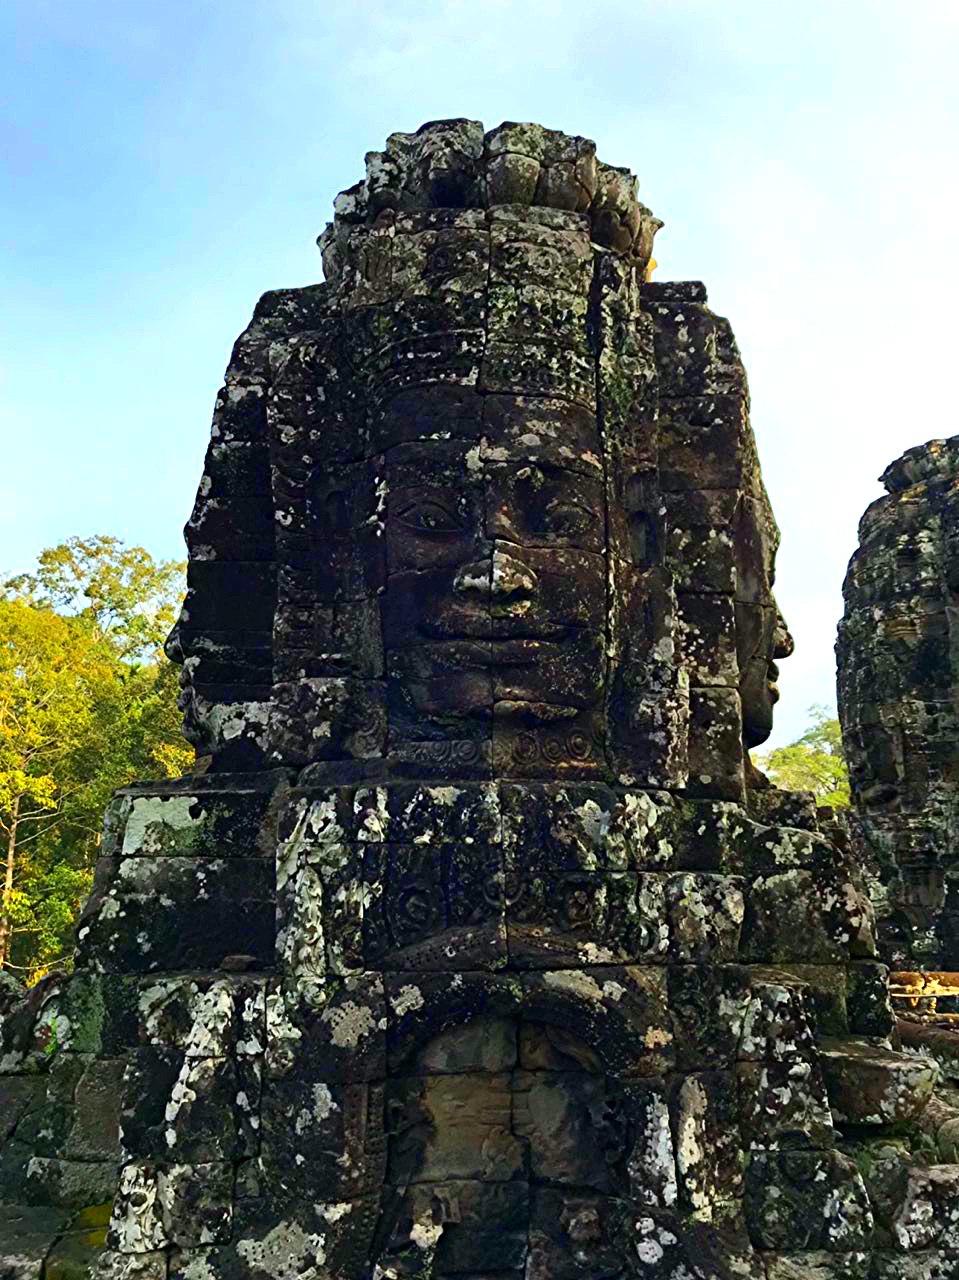 Елена Руденко (Валтея). Камбоджа. Ангкор. - Страница 2 Xy4k4sQ_Dx4